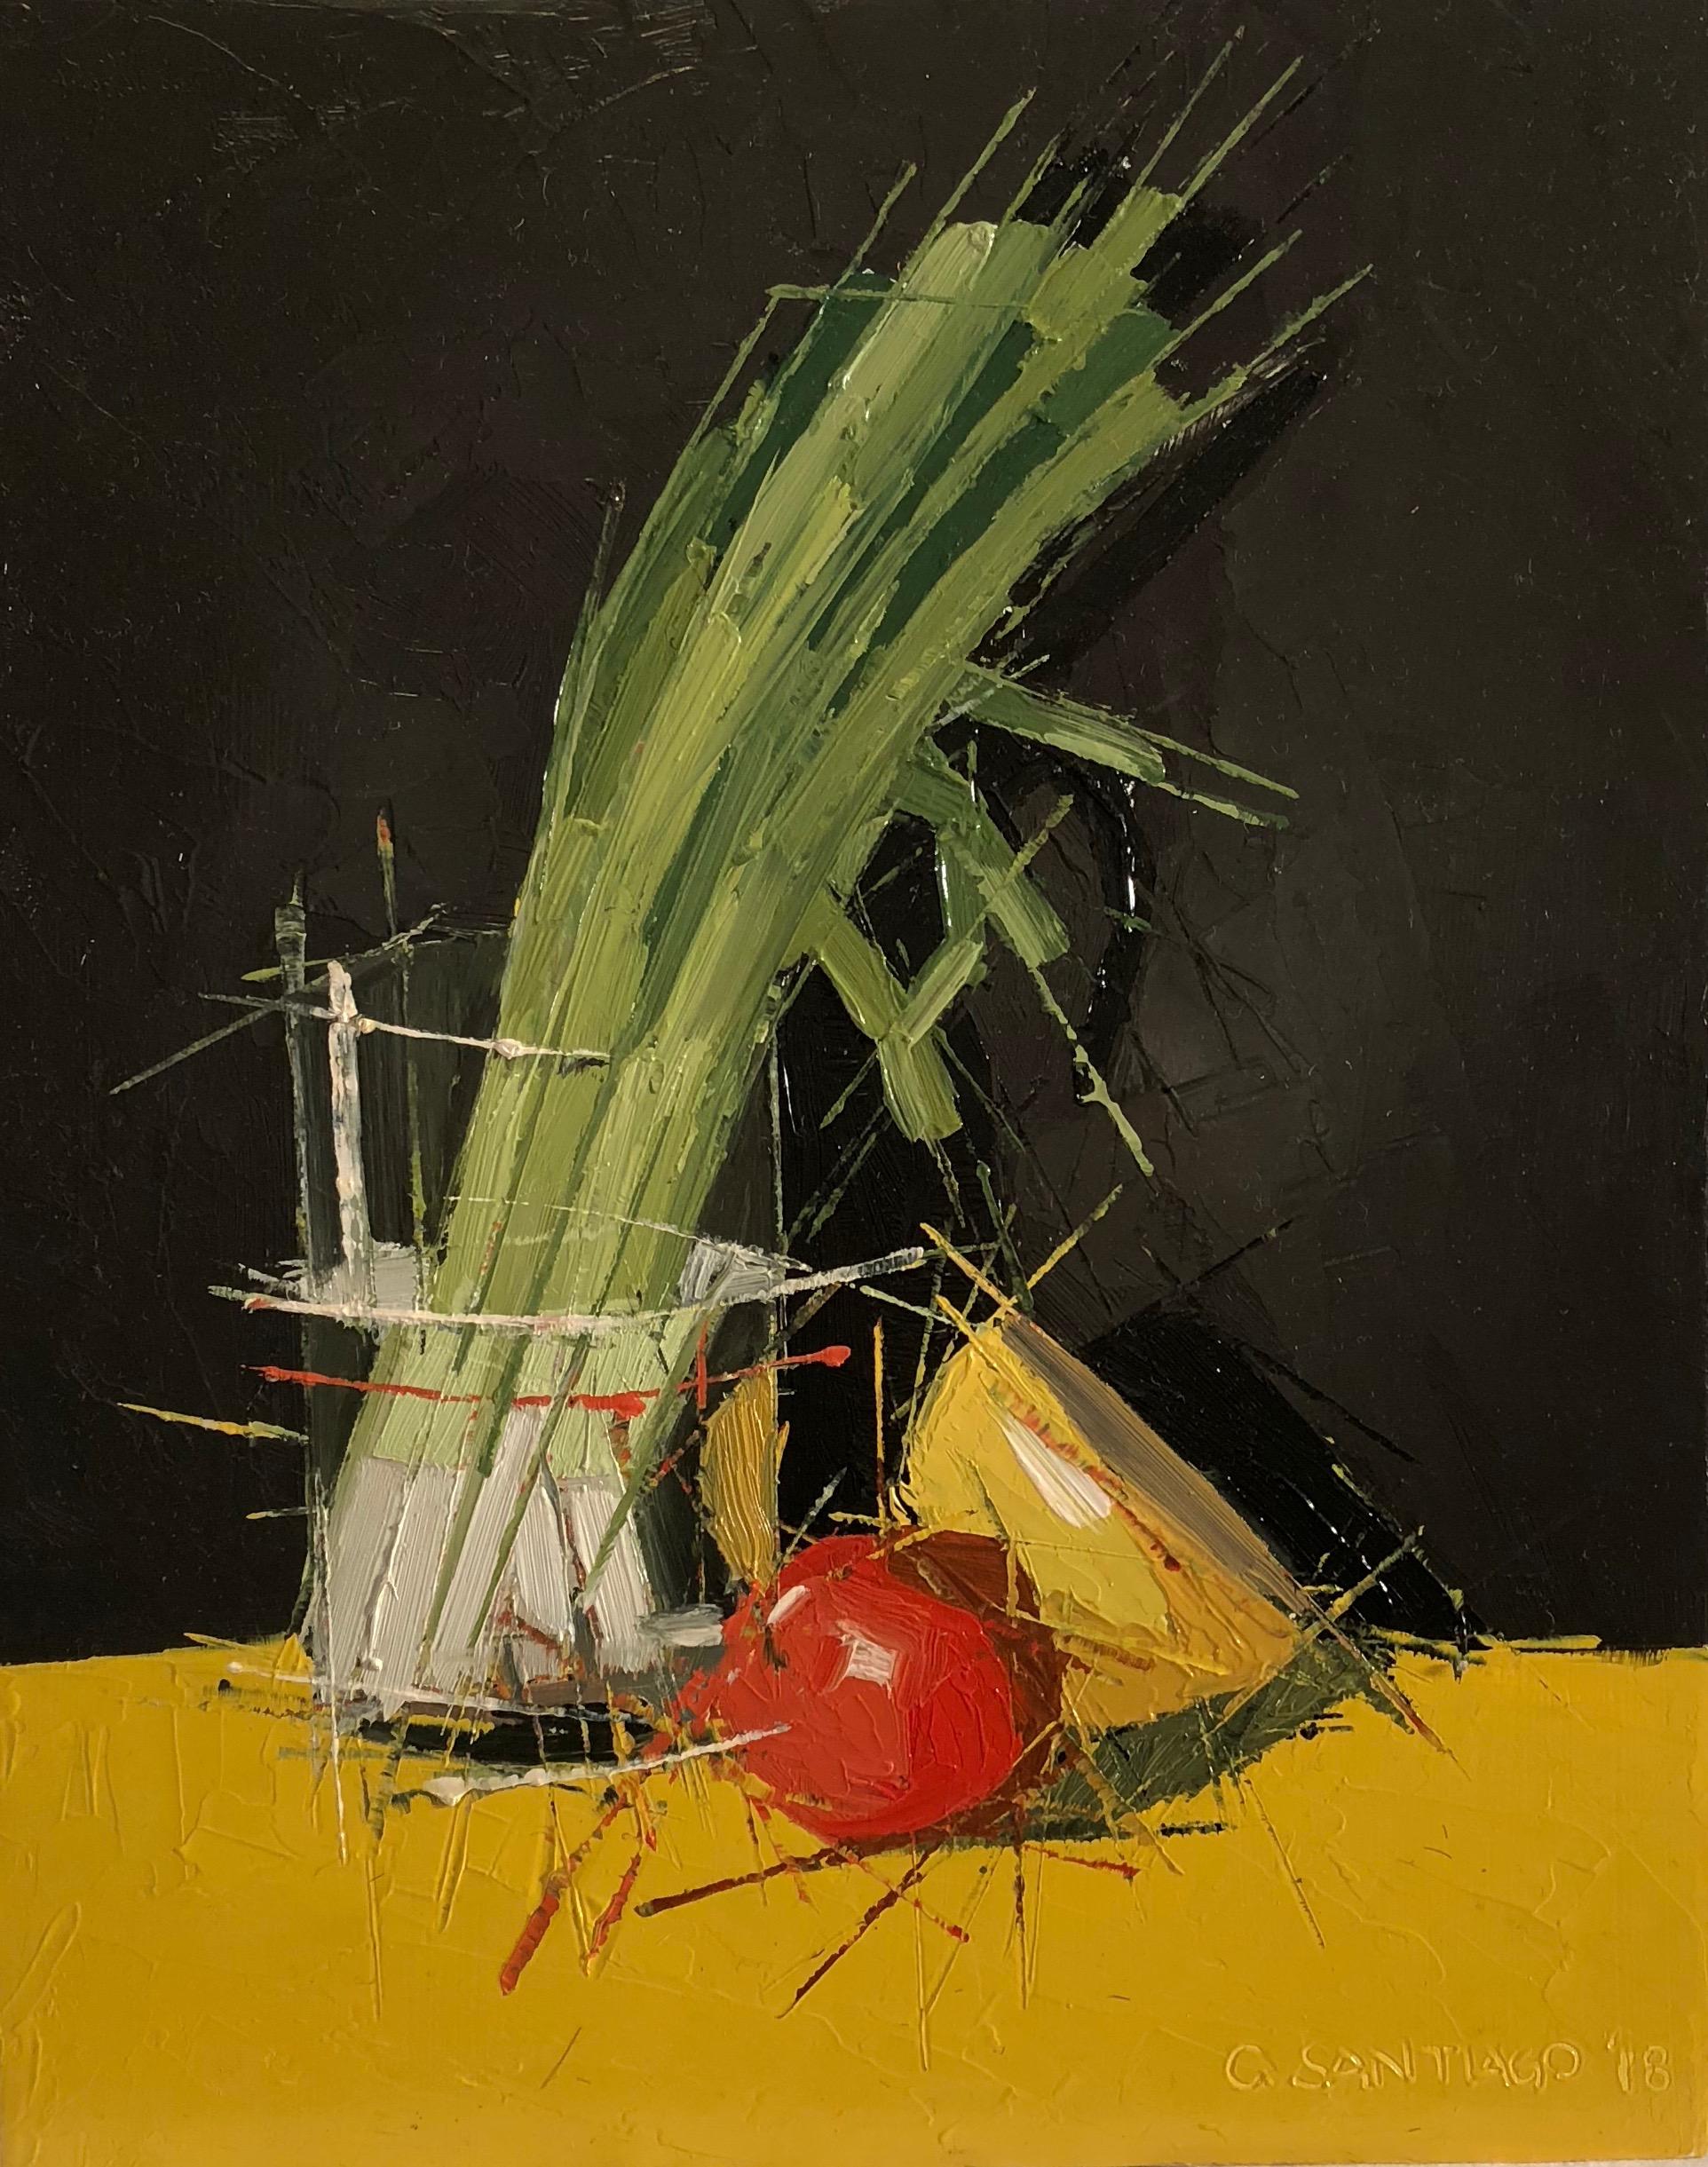 "Carlos Santiago ,  Spring Onion , oil on panel, 10"" x 8"", sold"